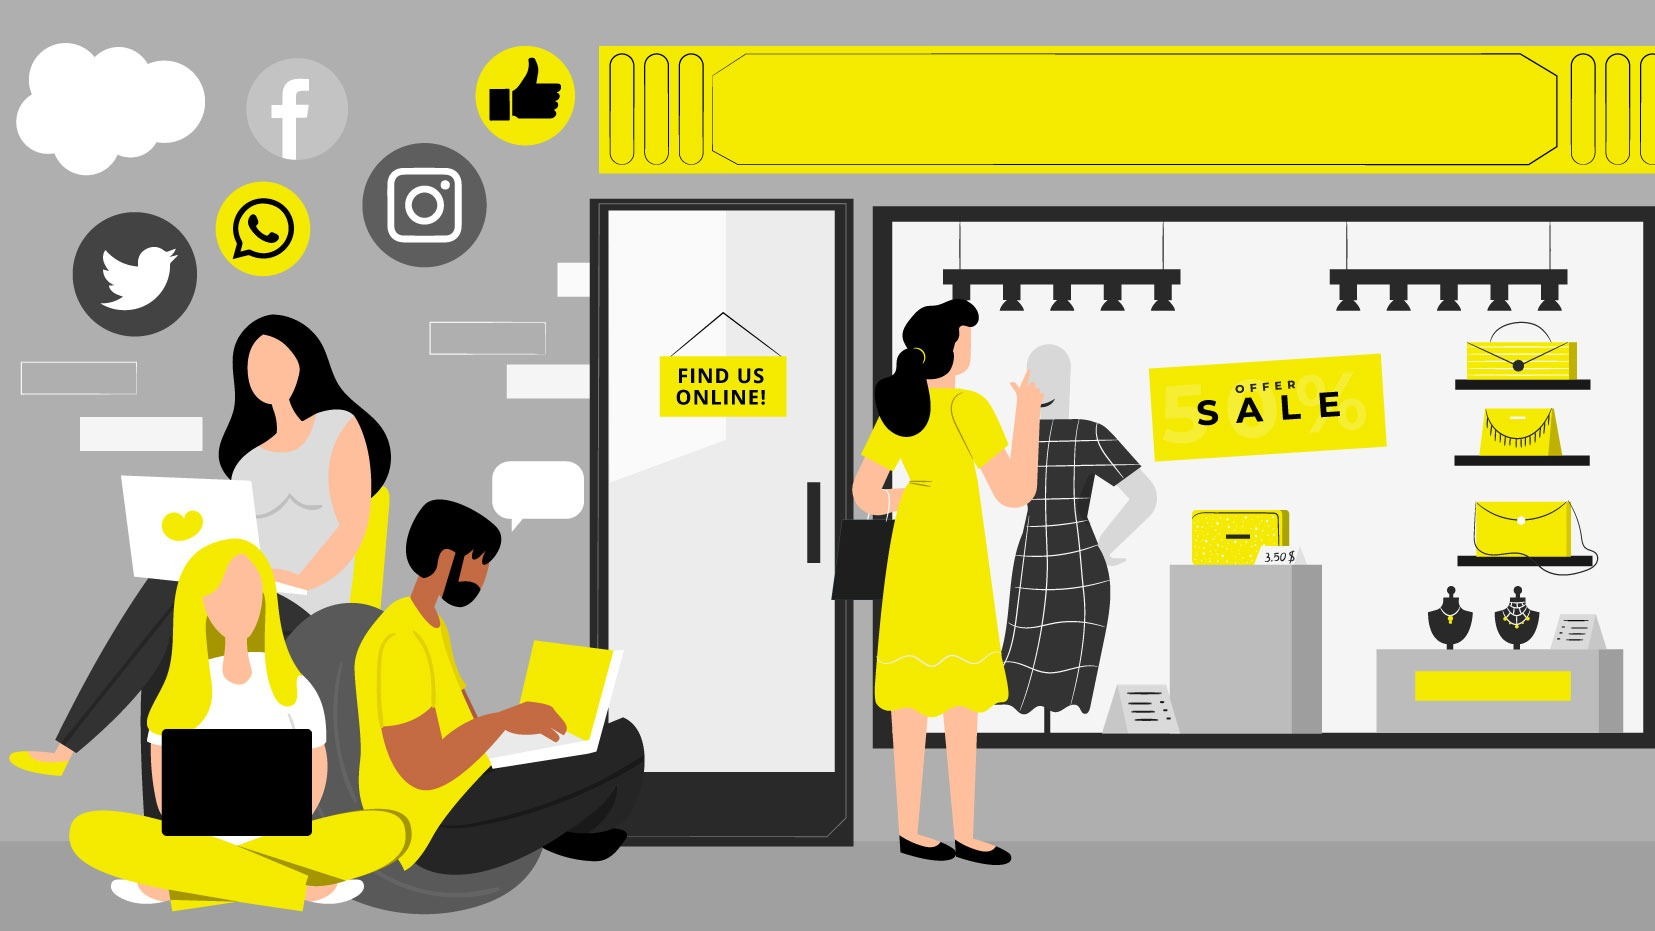 eCommerce & New Consumer Behaviors